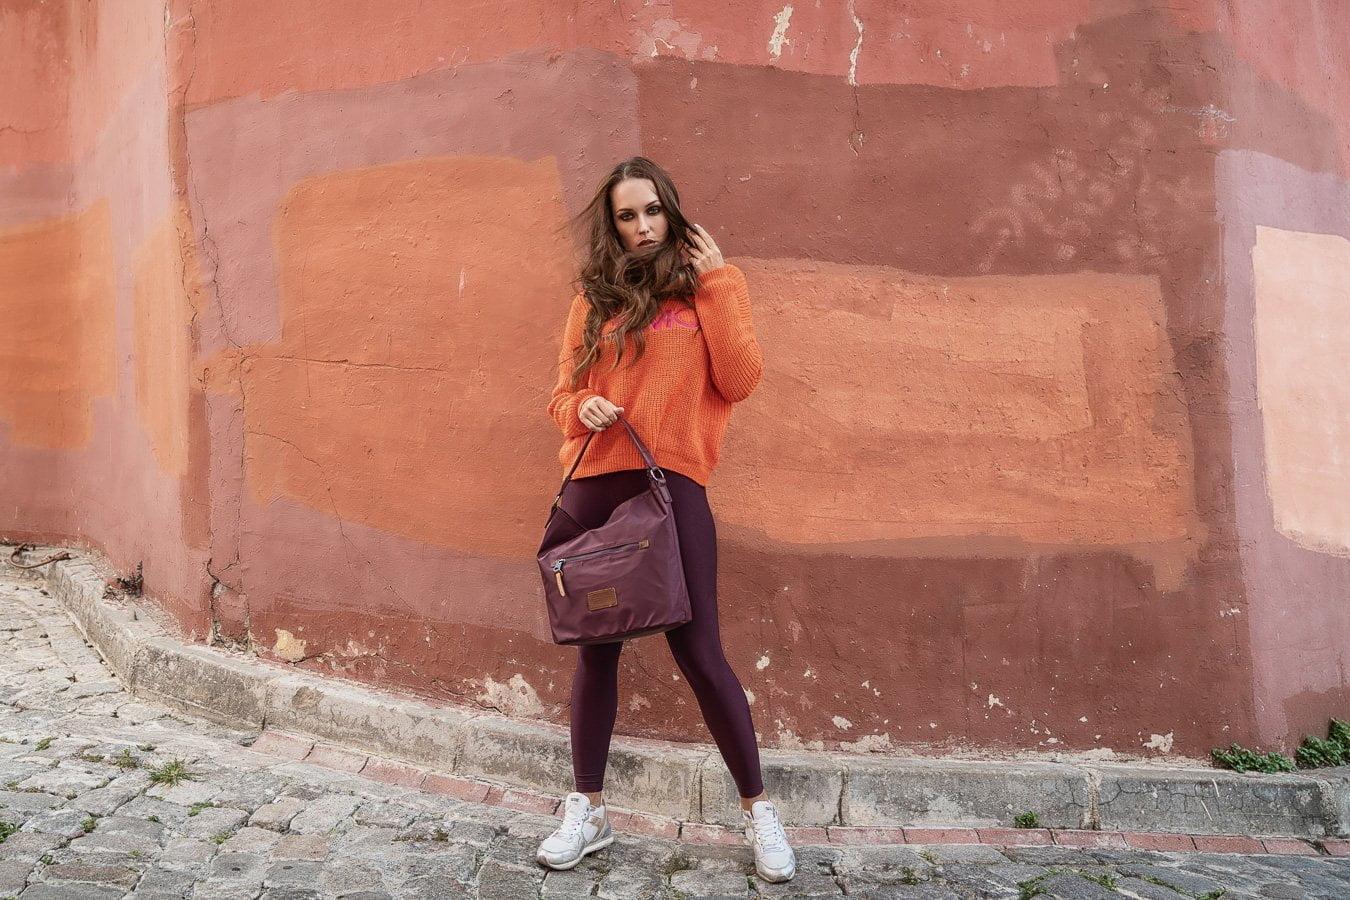 Moda Çekimi - Editorial - Beauty moda tekstil burakbulutfotografatolyesi 20